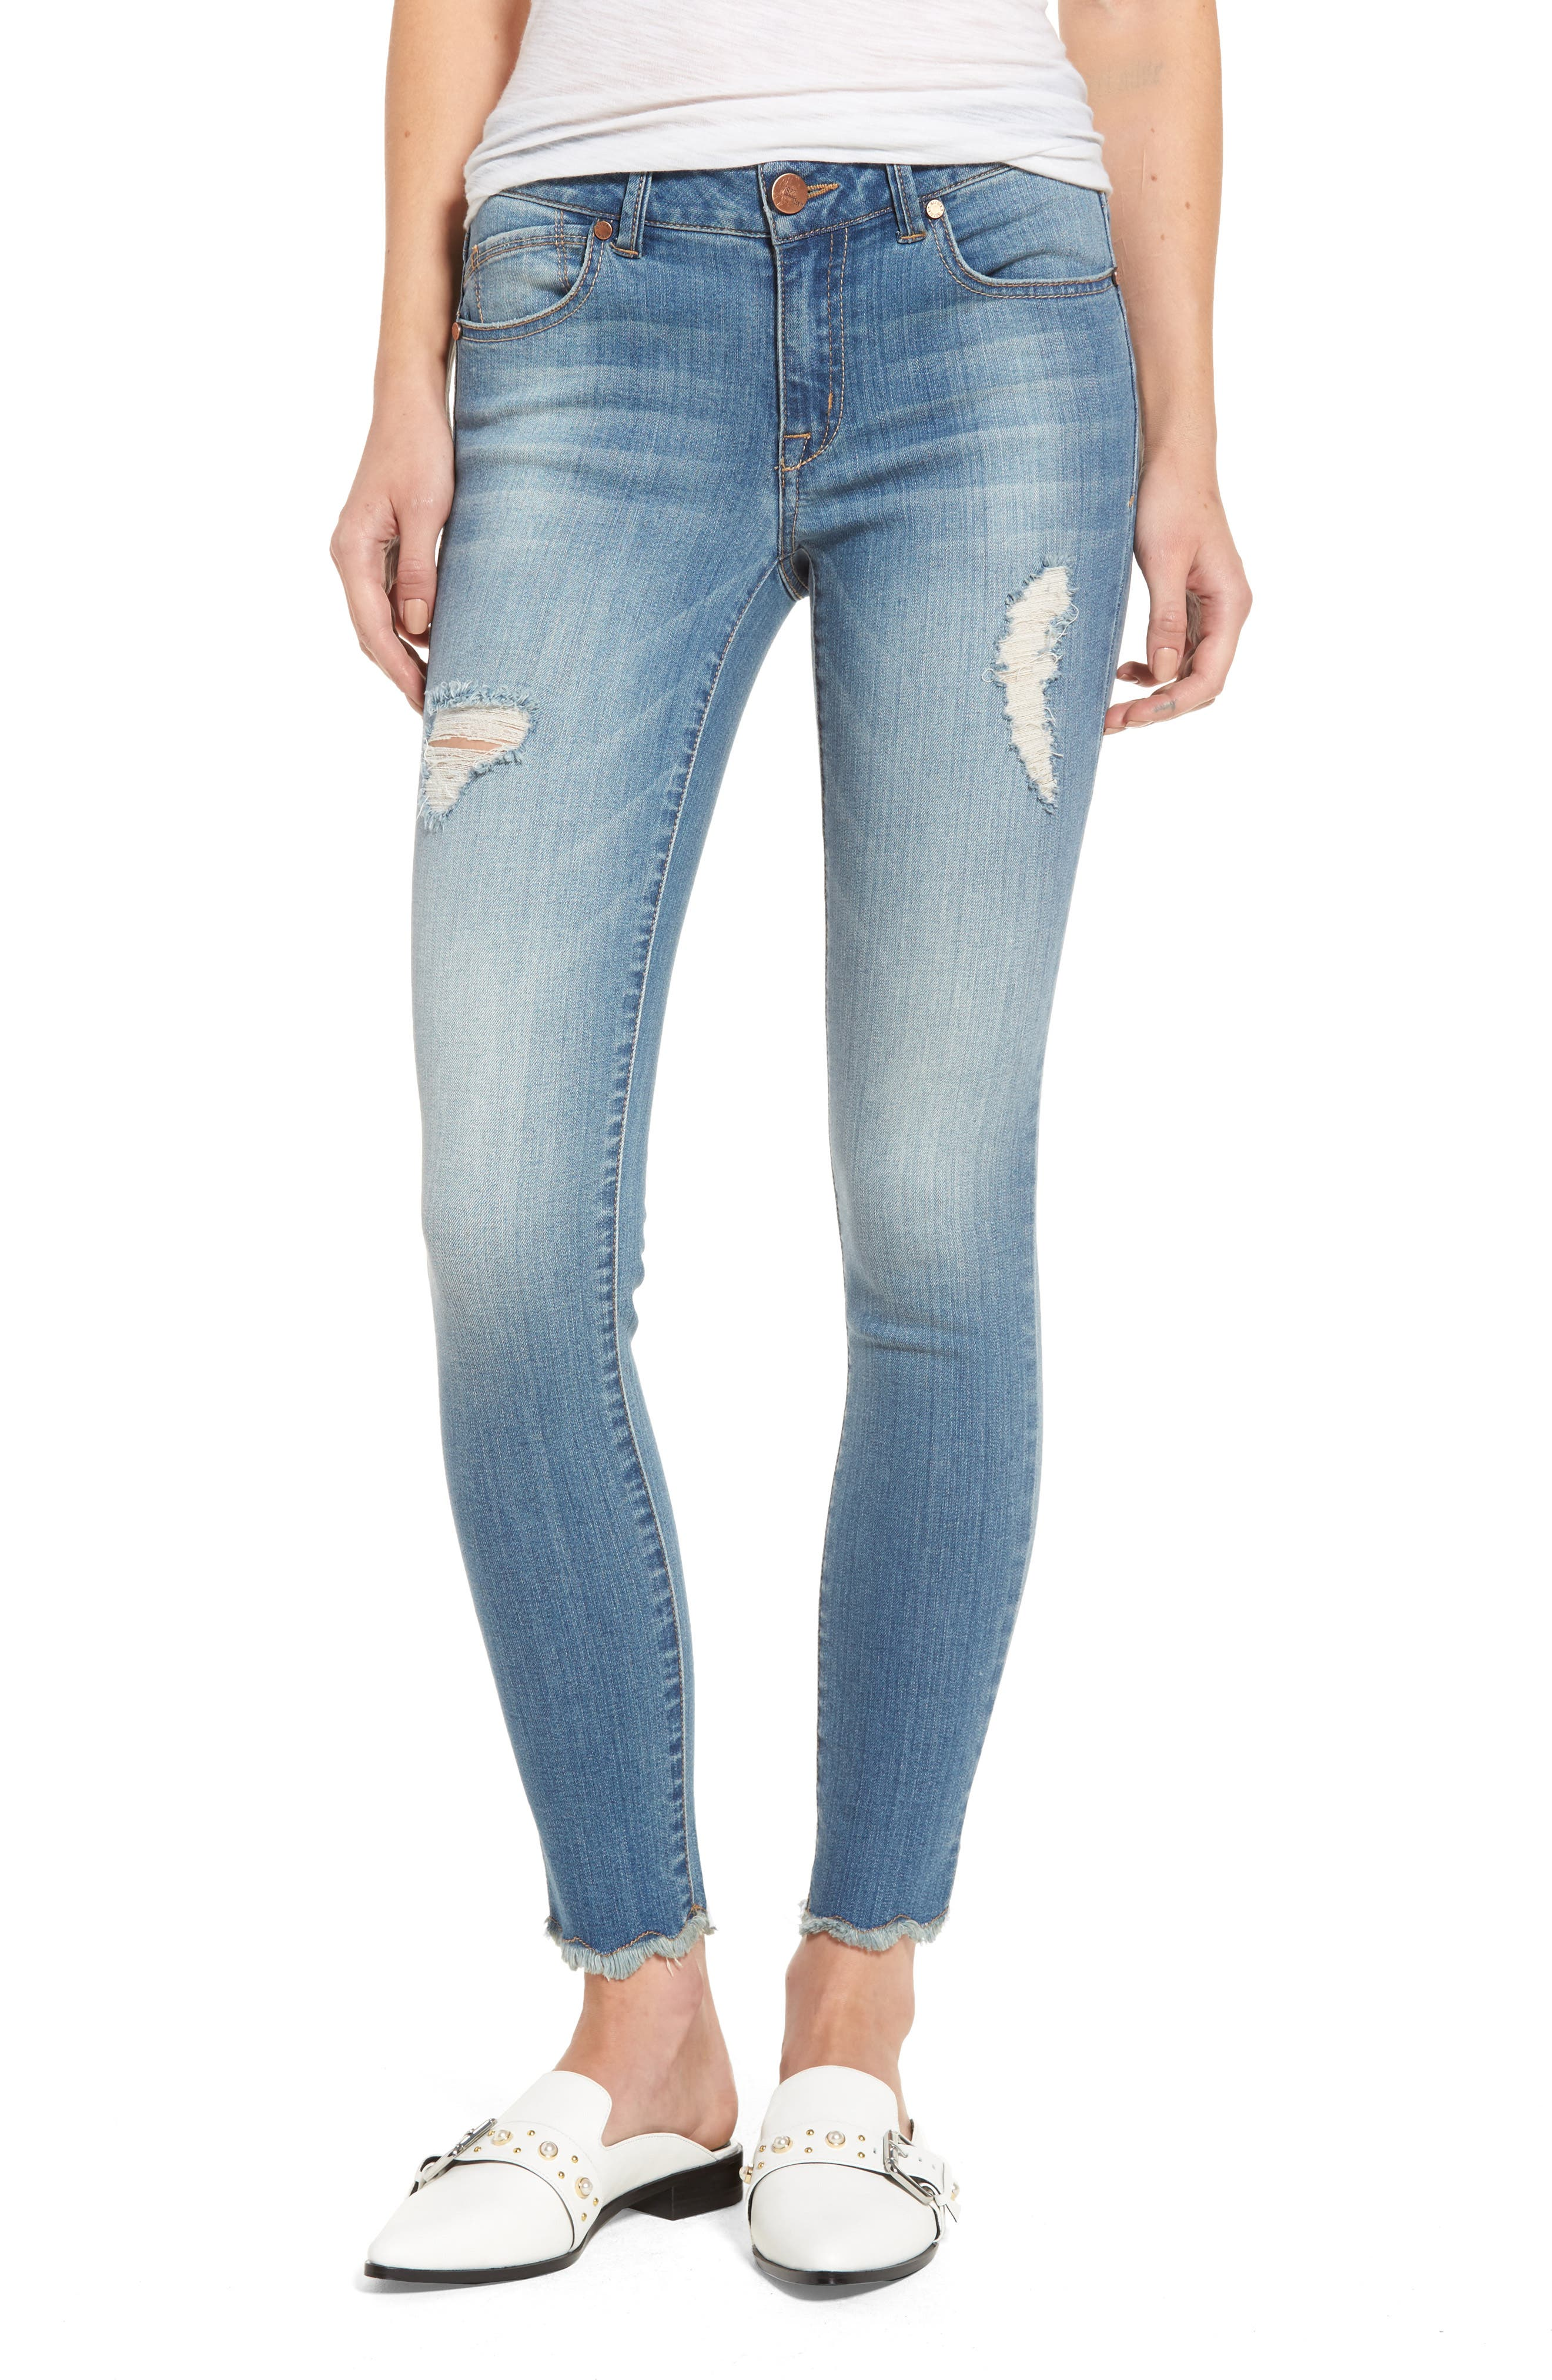 1822 Denim Raw Edge Skinny Jeans (Wesley)